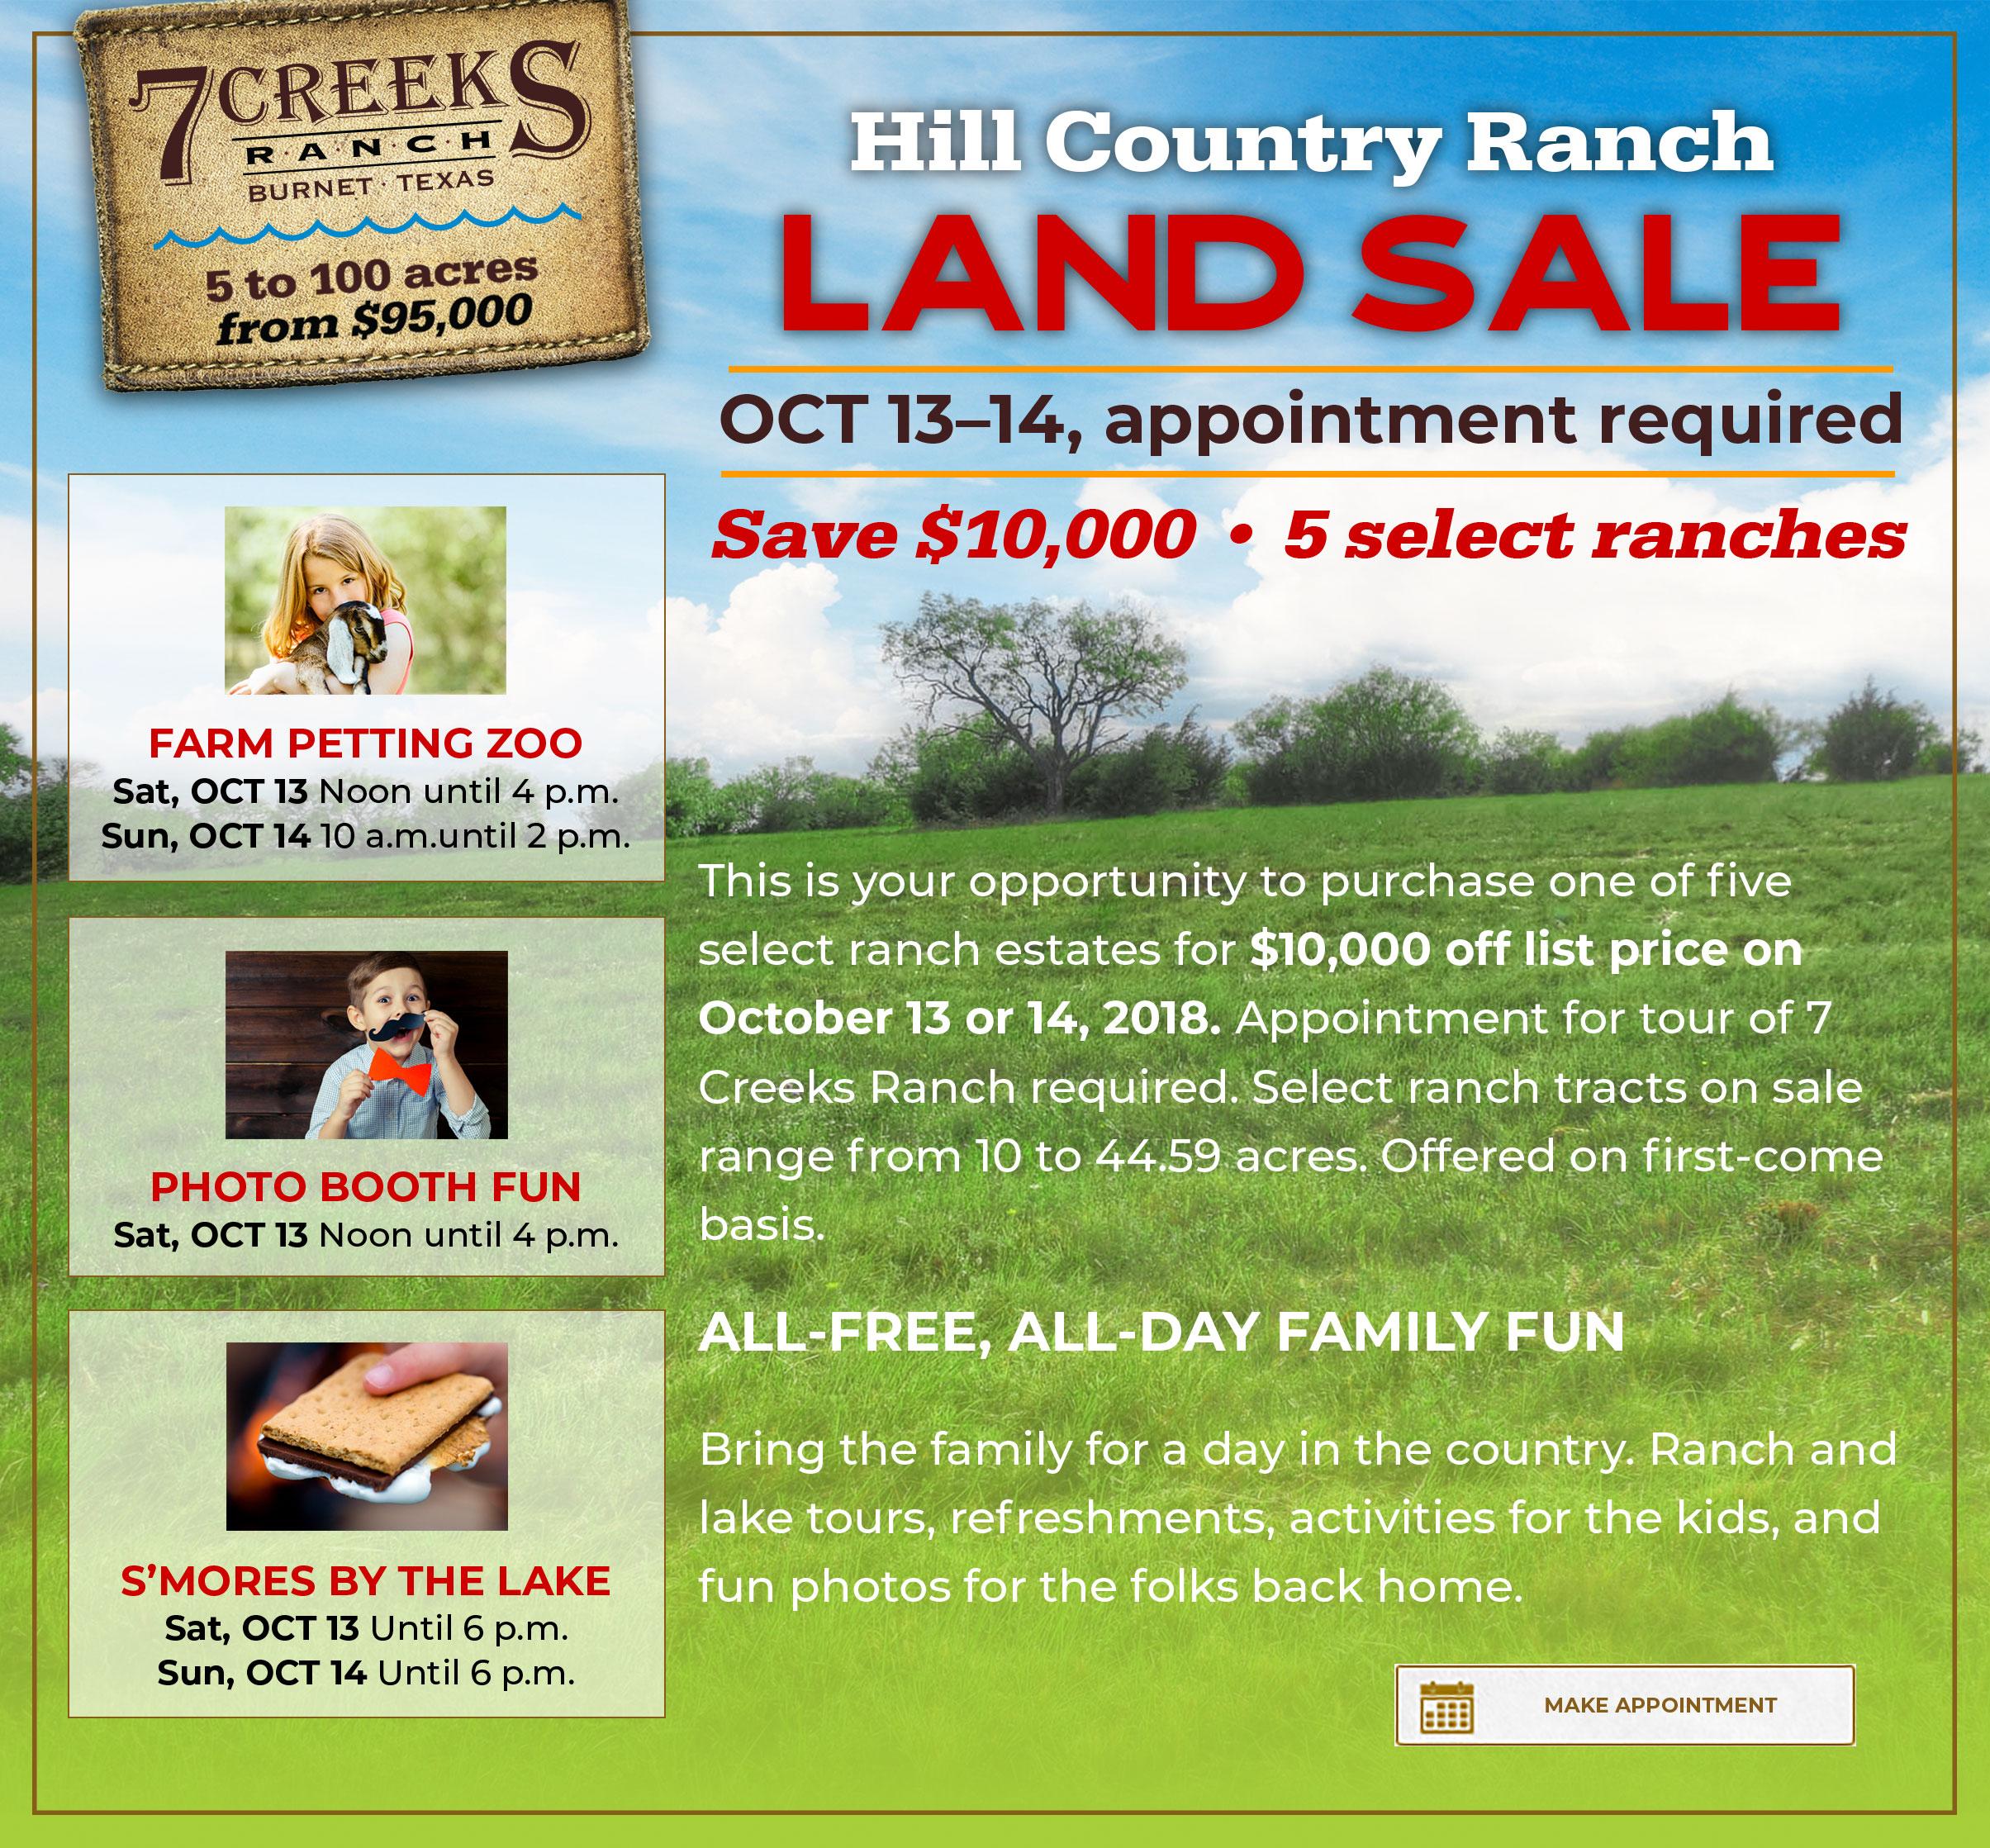 7 Creeks Ranch